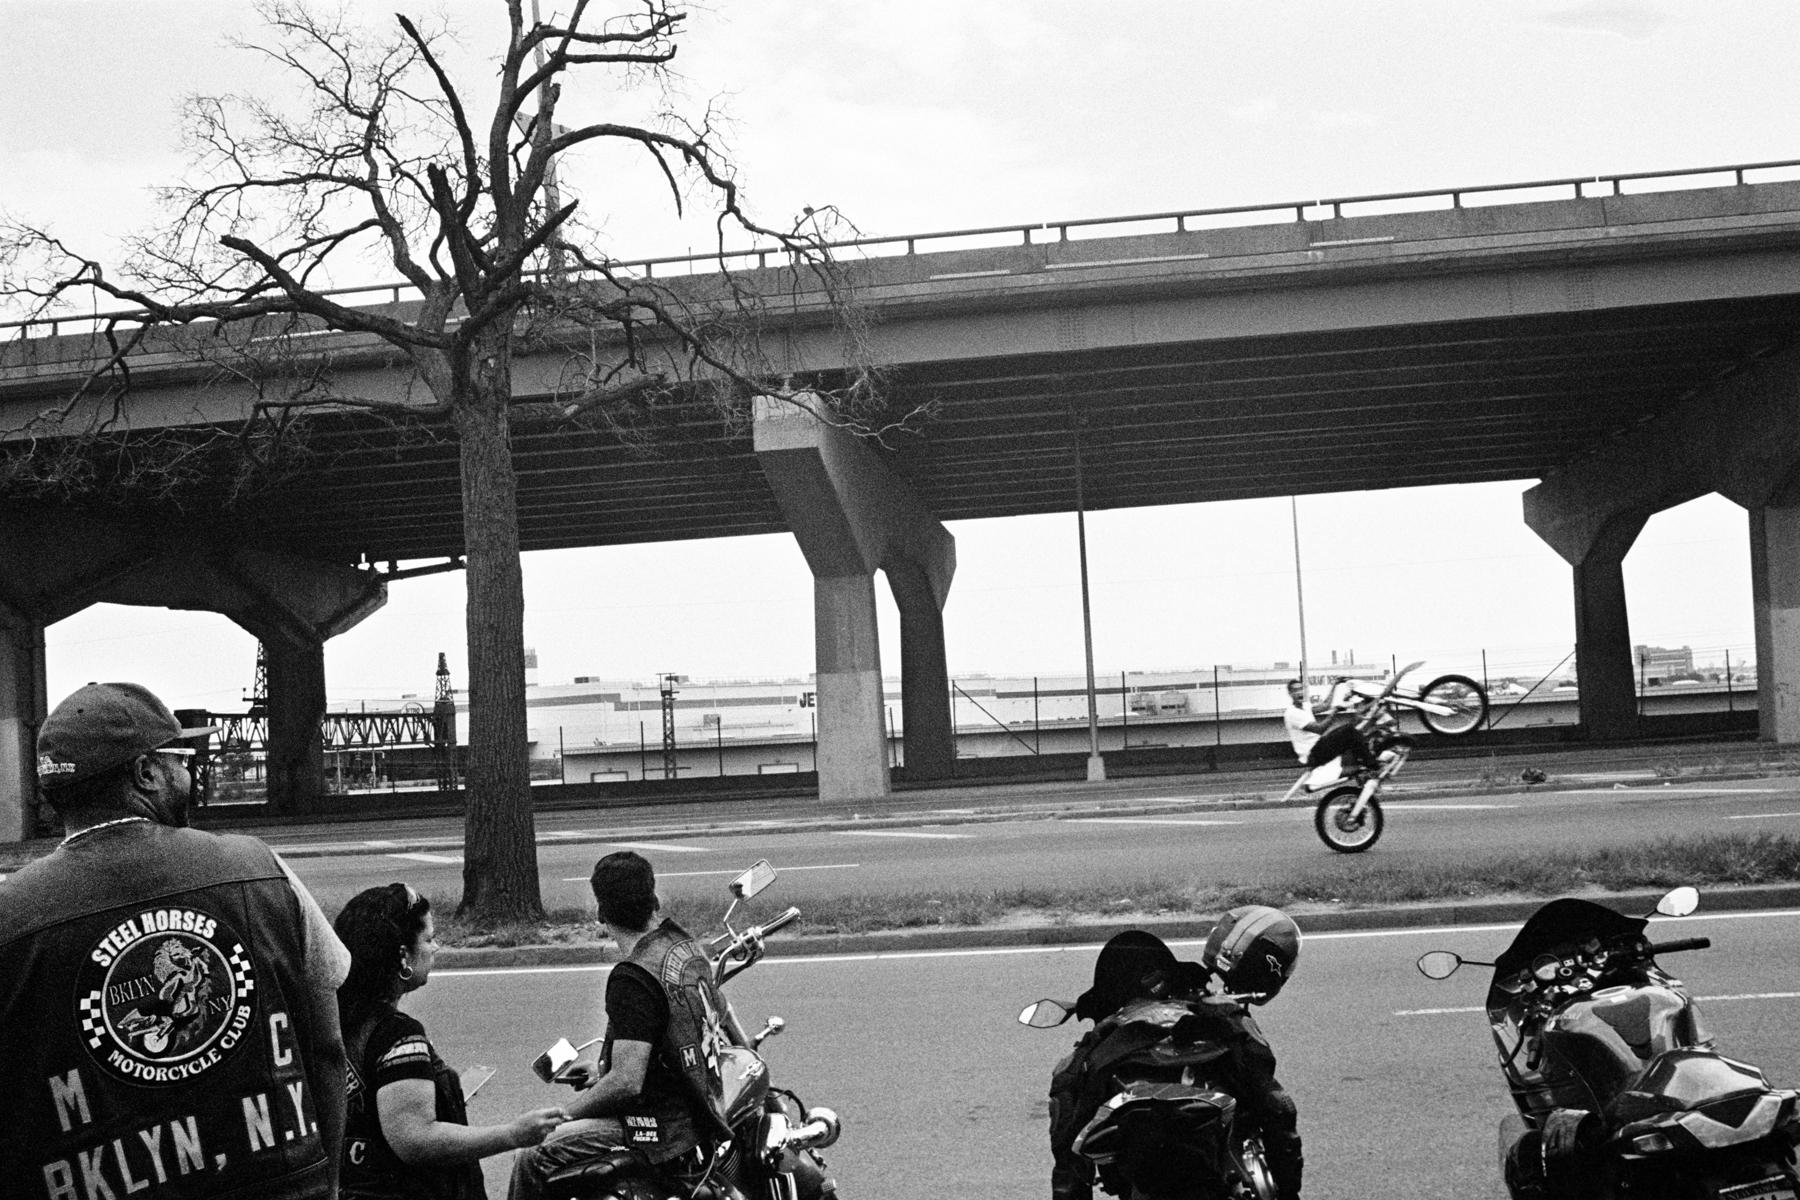 Wheelie on Bruckner Boulevard, The Bronx, 2015